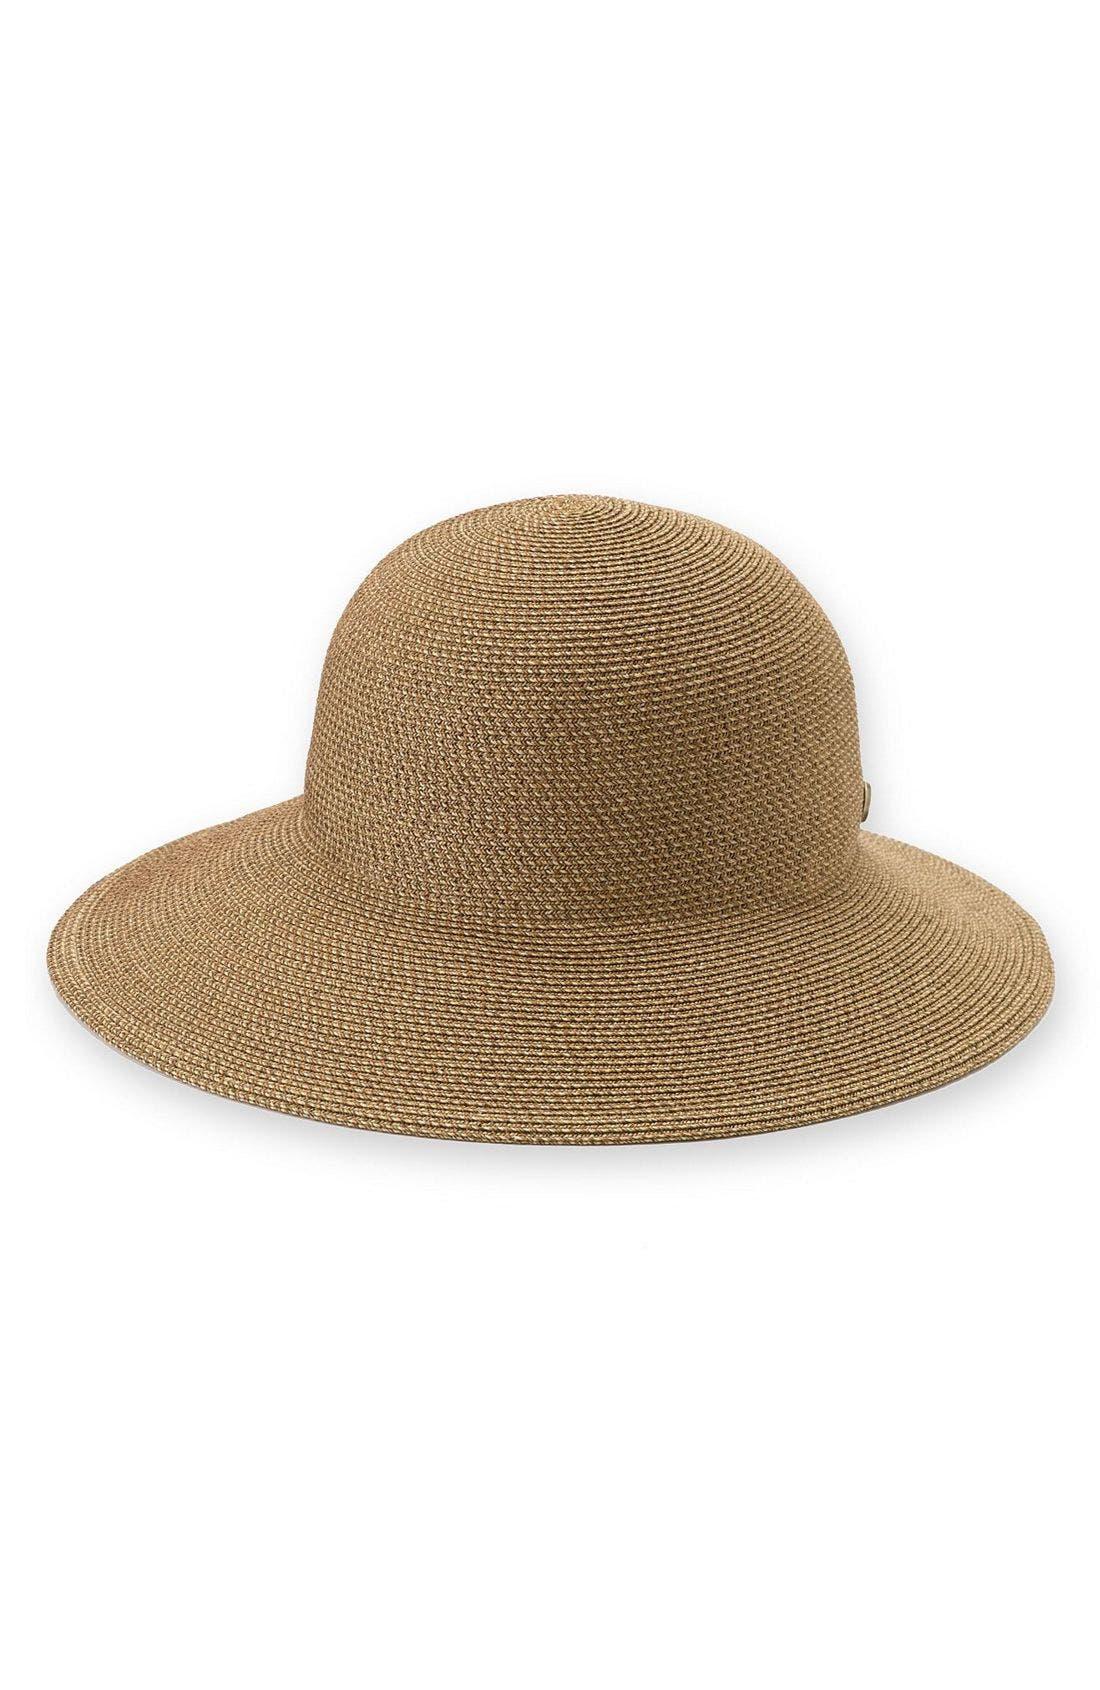 Eric Javits 'Squishee® IV' Wide Brim Hat